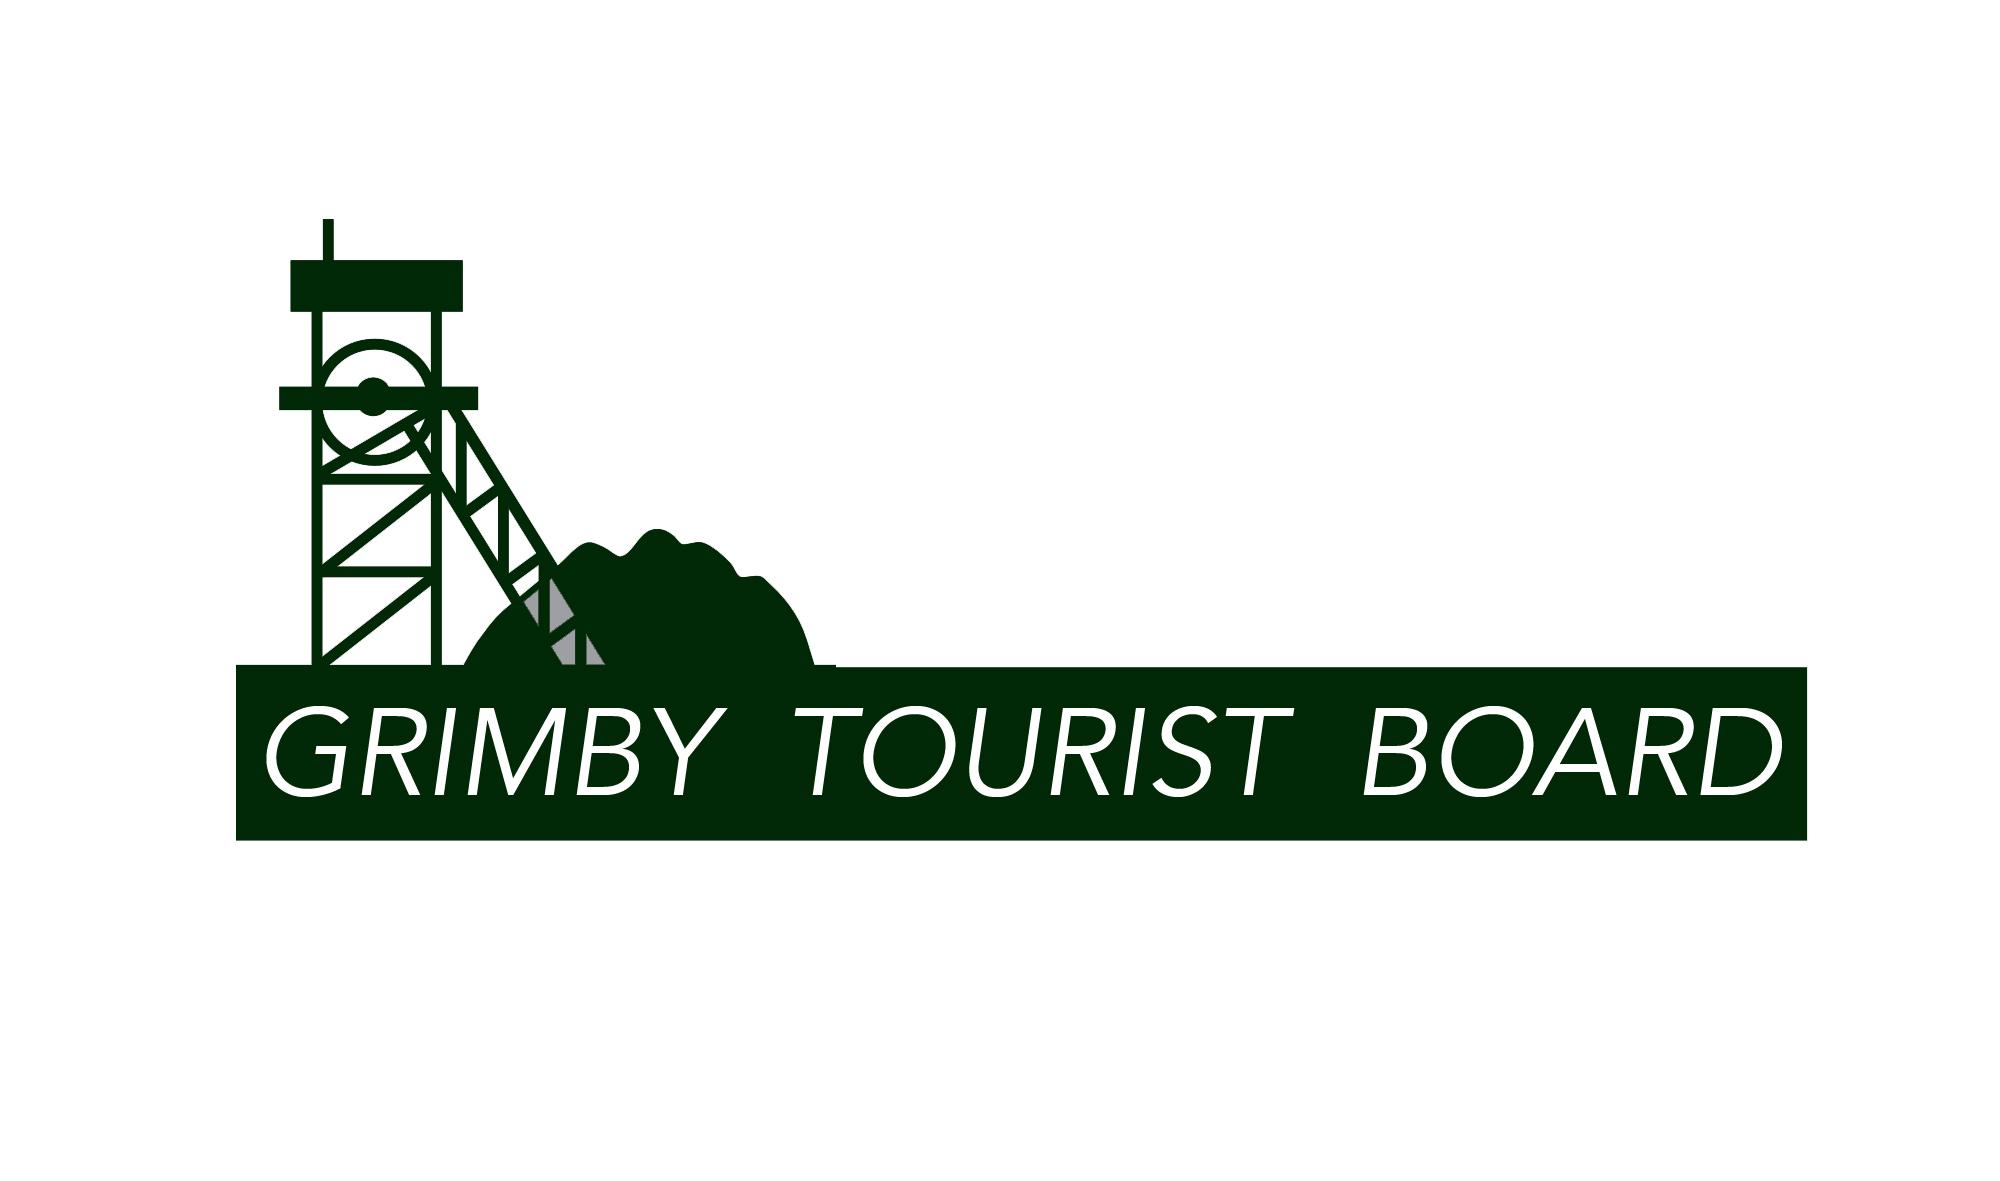 Grimby Tourist Board